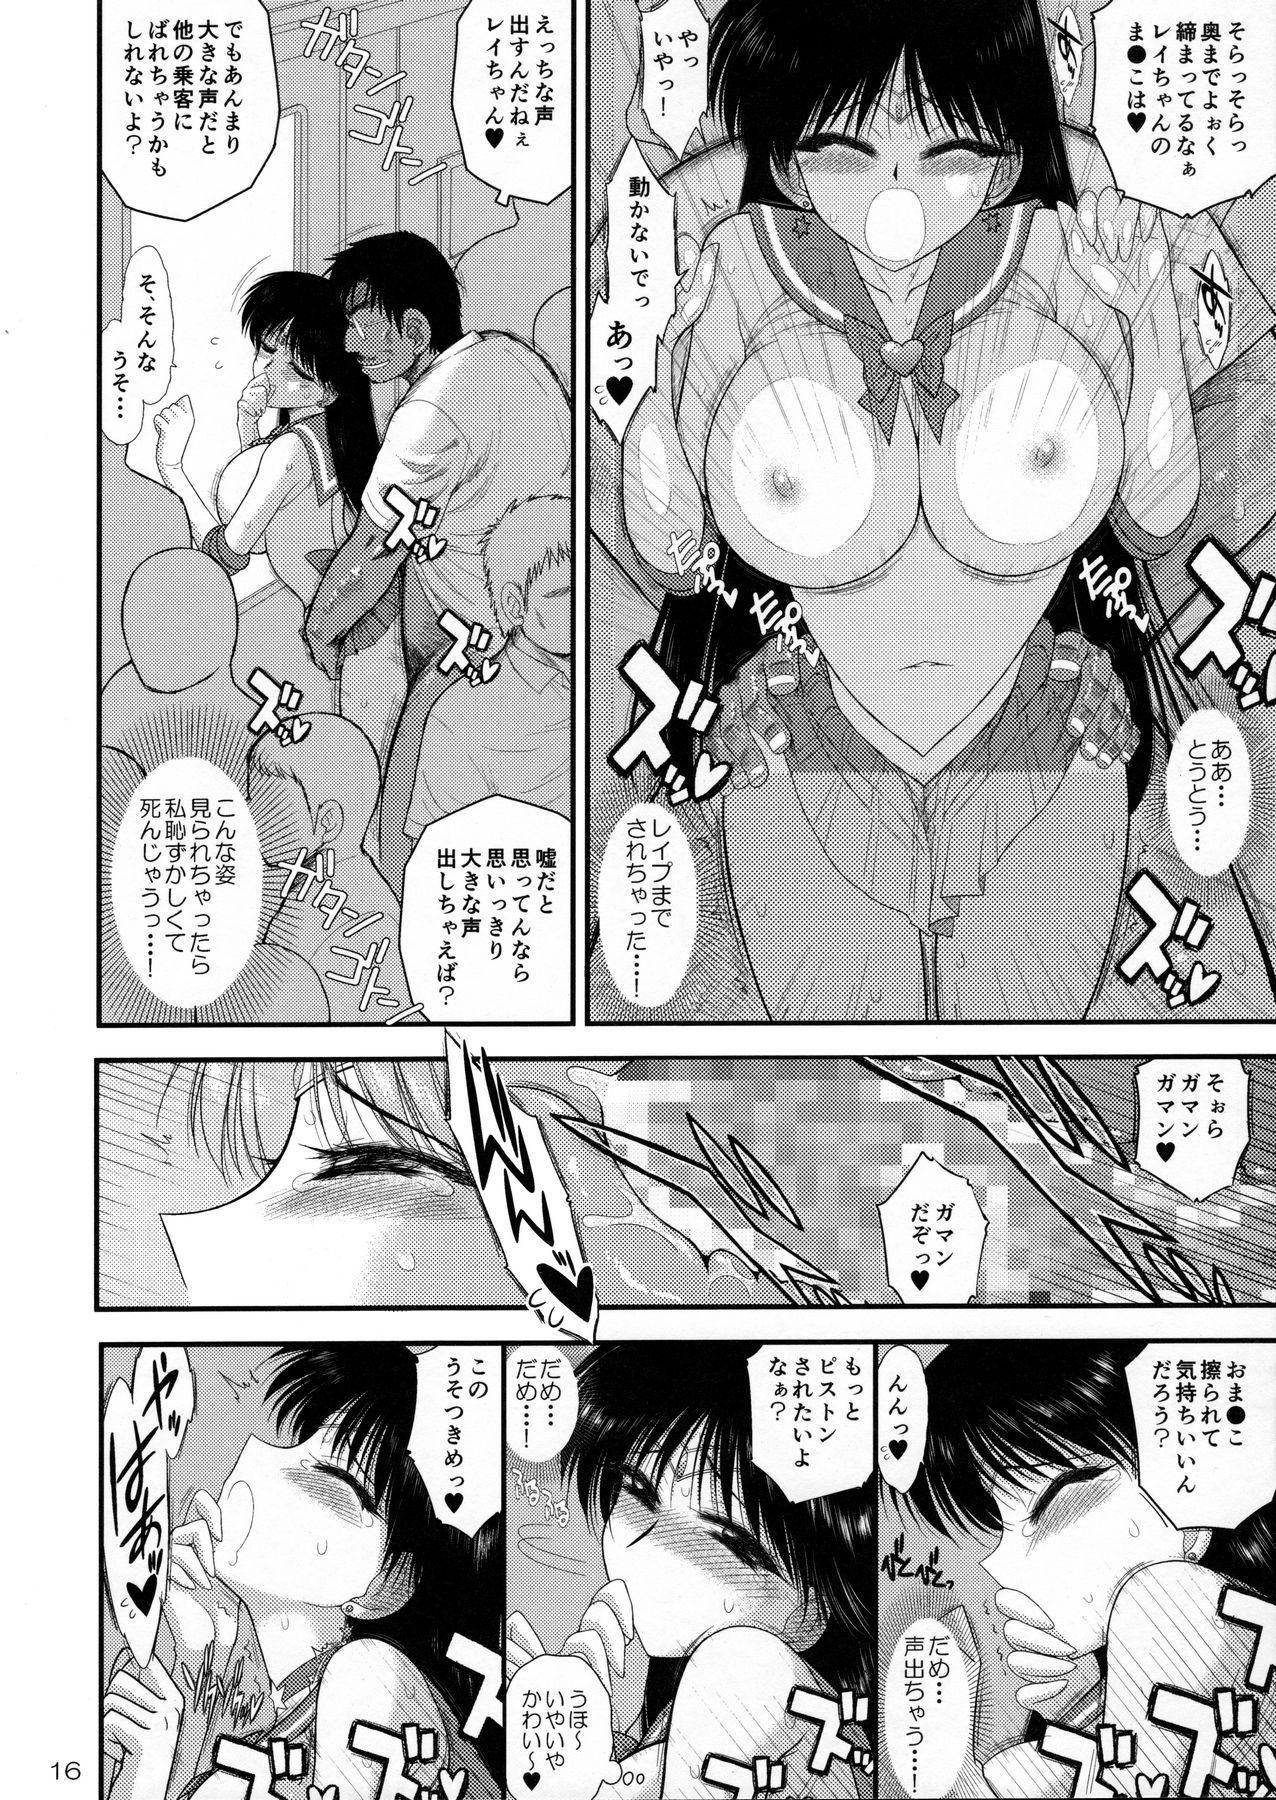 The Fertilization of Rei Hino 15